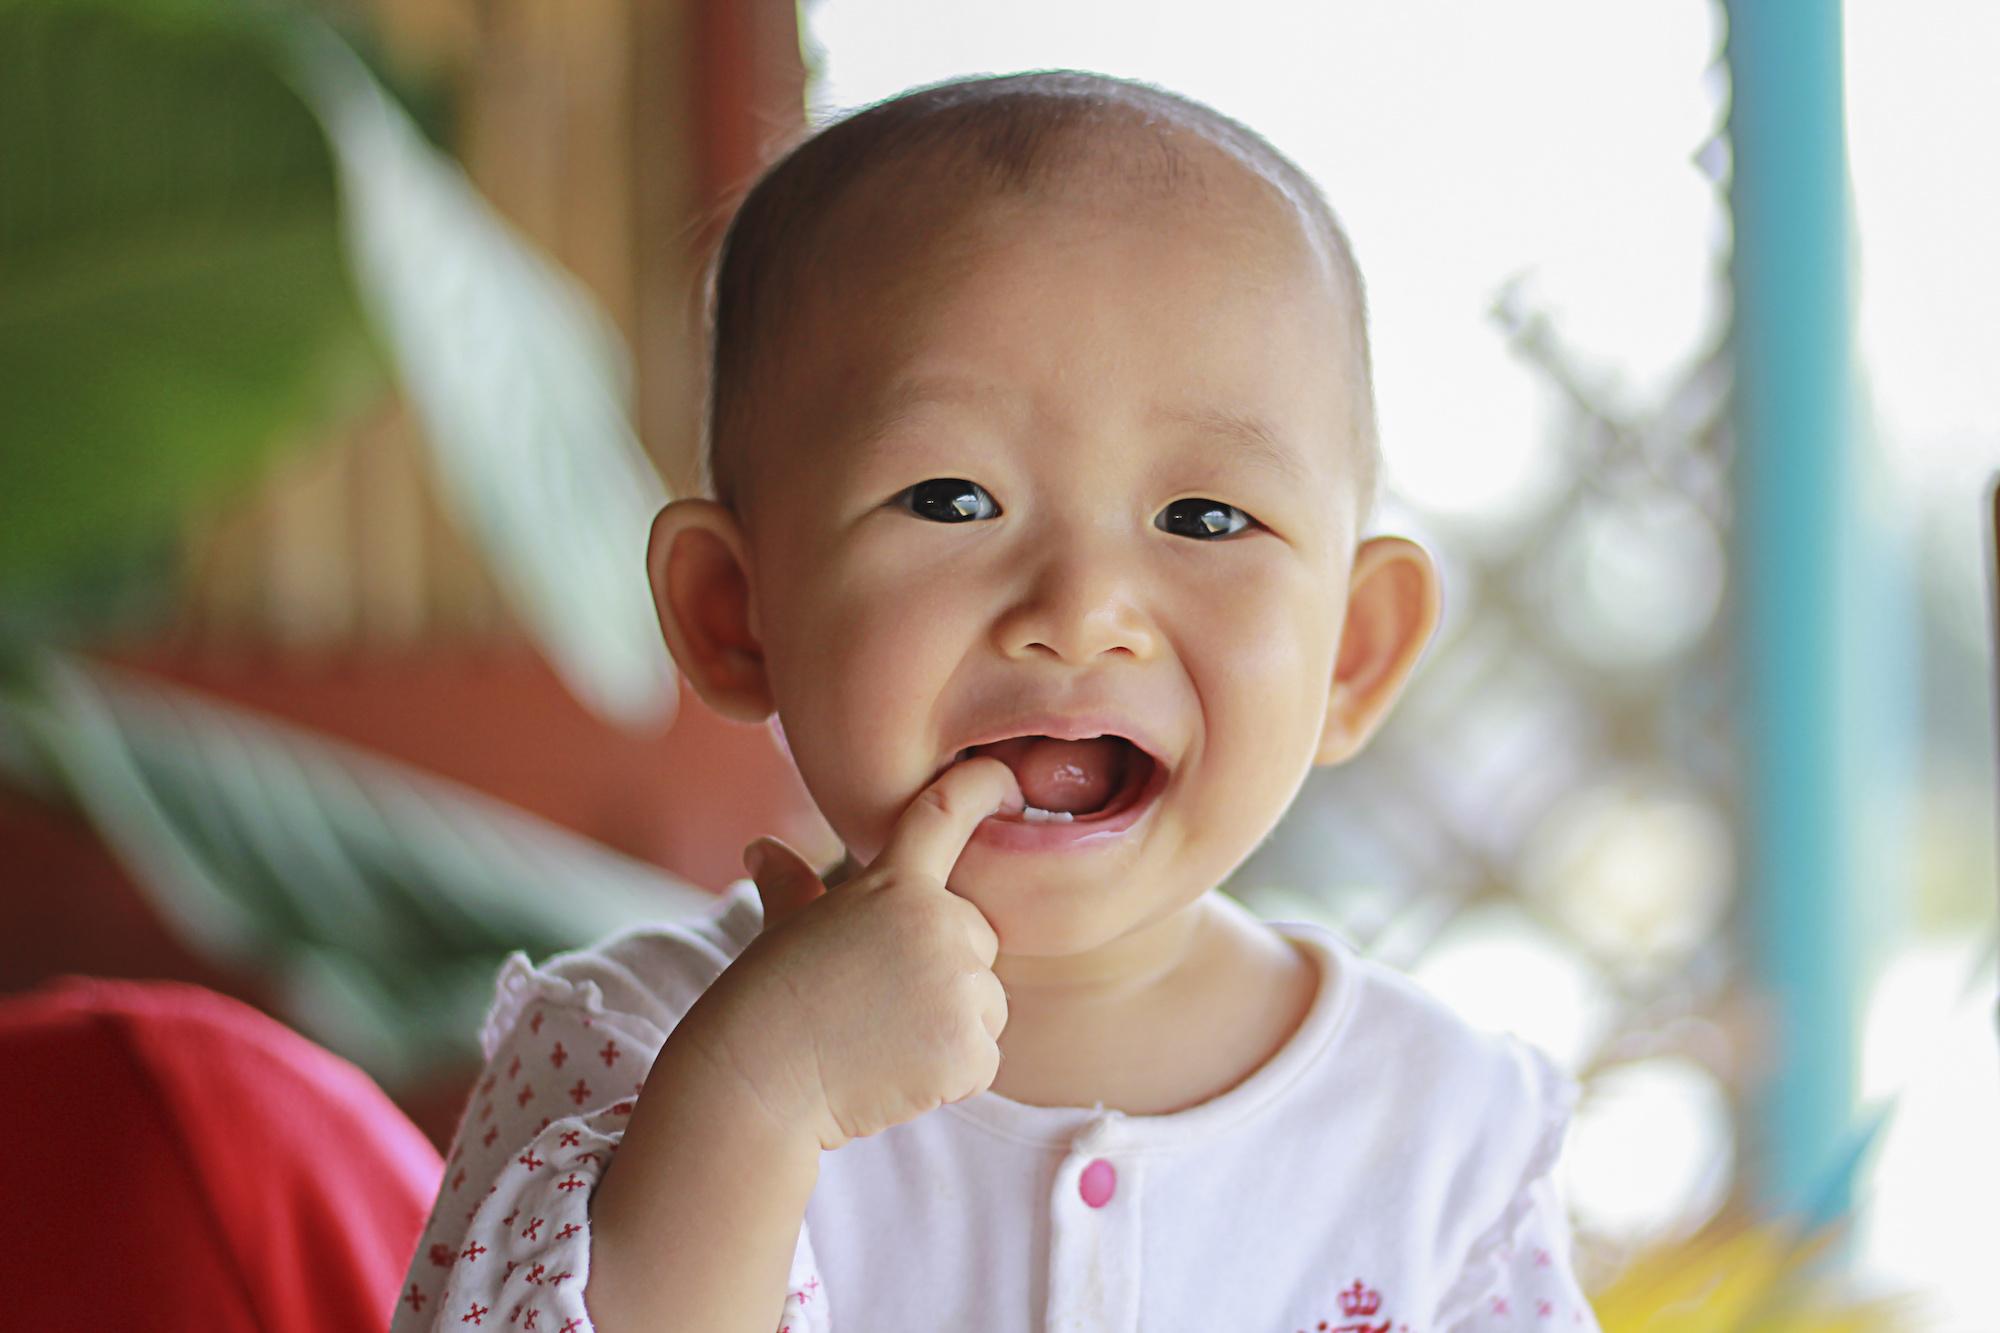 Toddler with tender gums